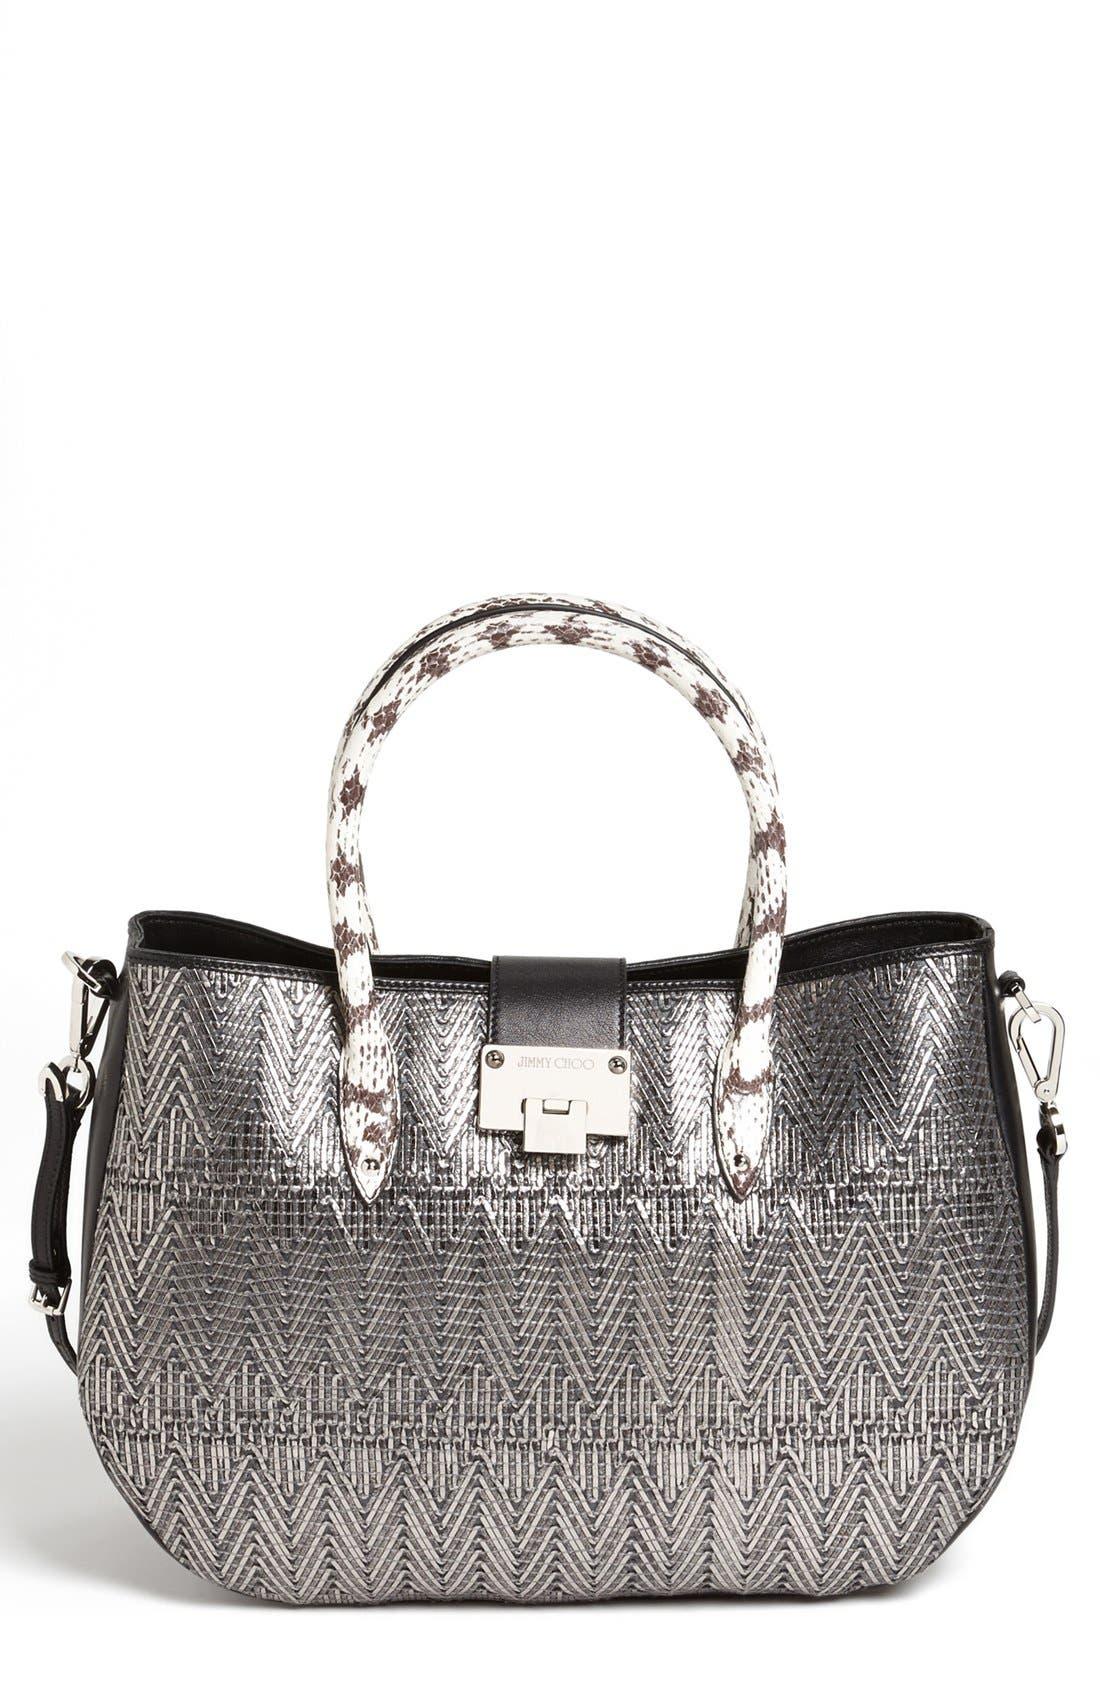 Main Image - Jimmy Choo 'Rania' Leather Satchel